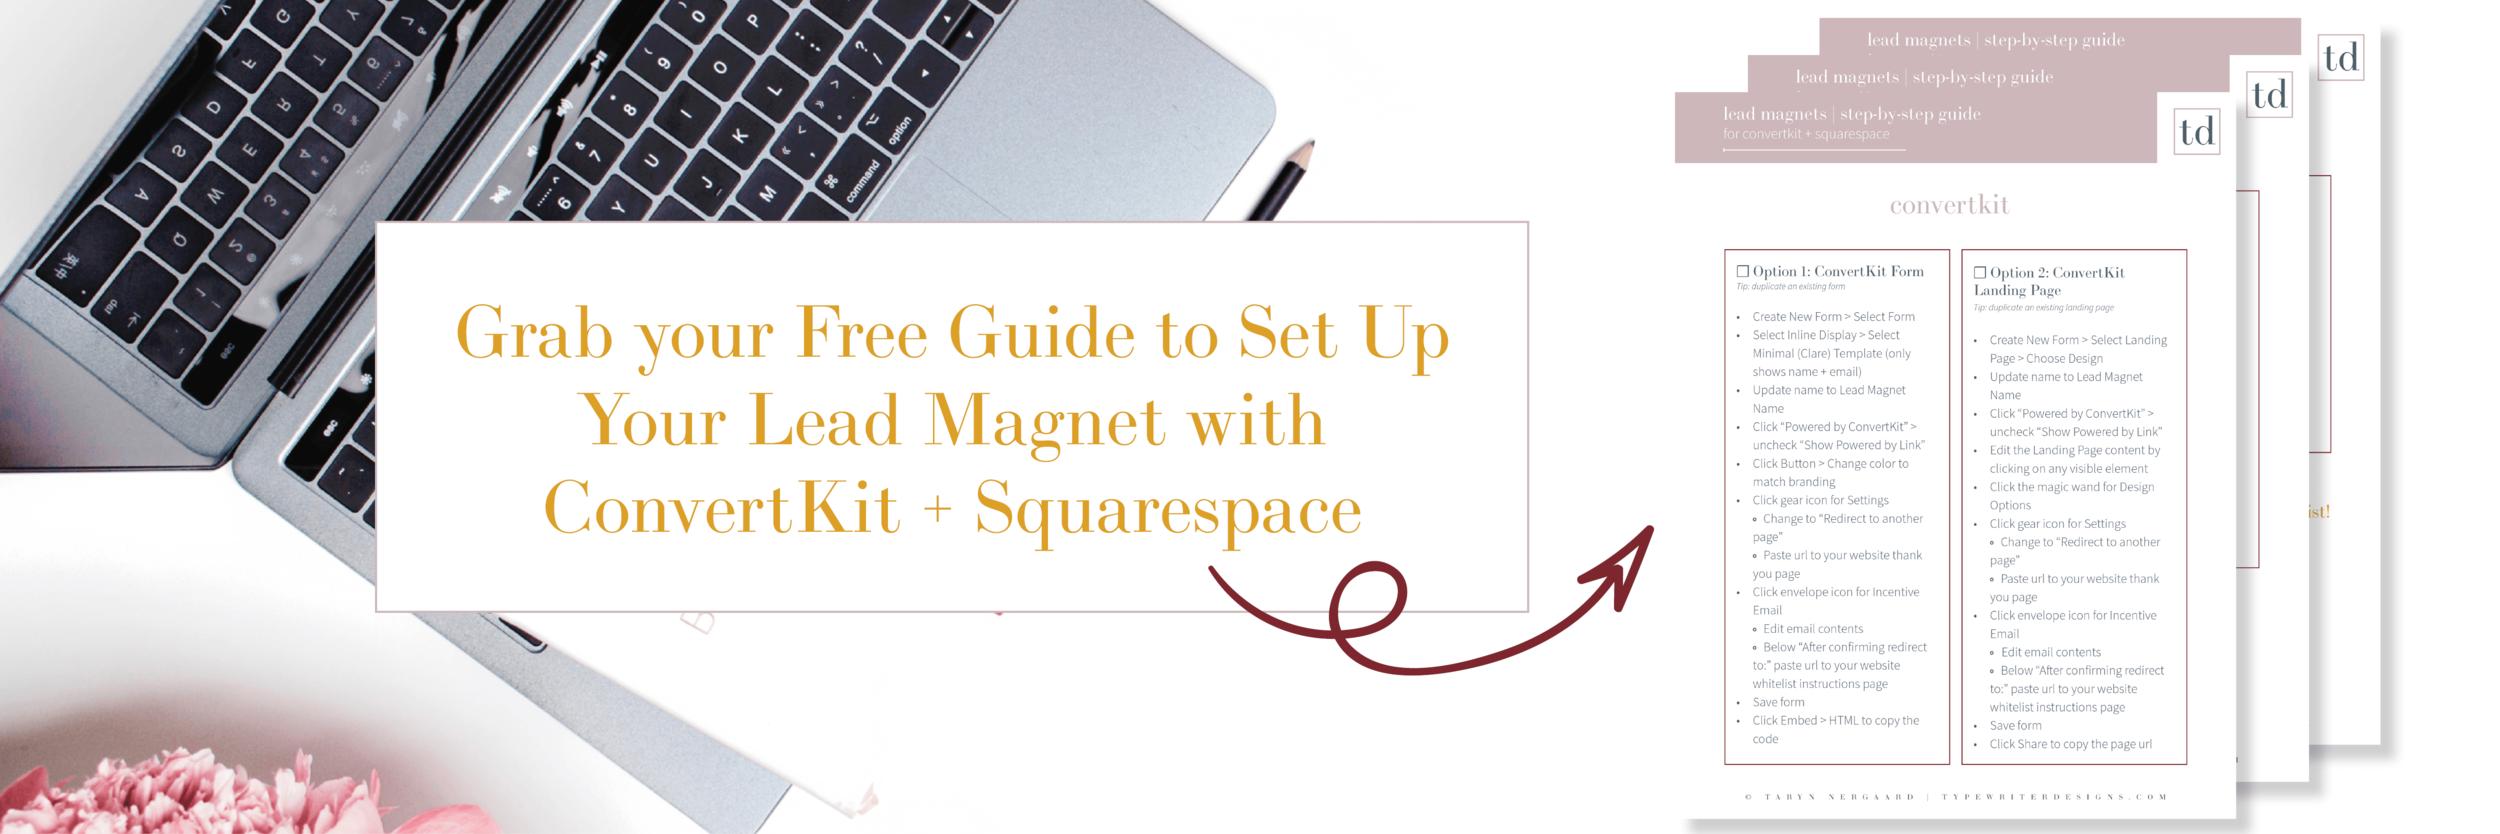 guide lead magnet convertkit squarespace